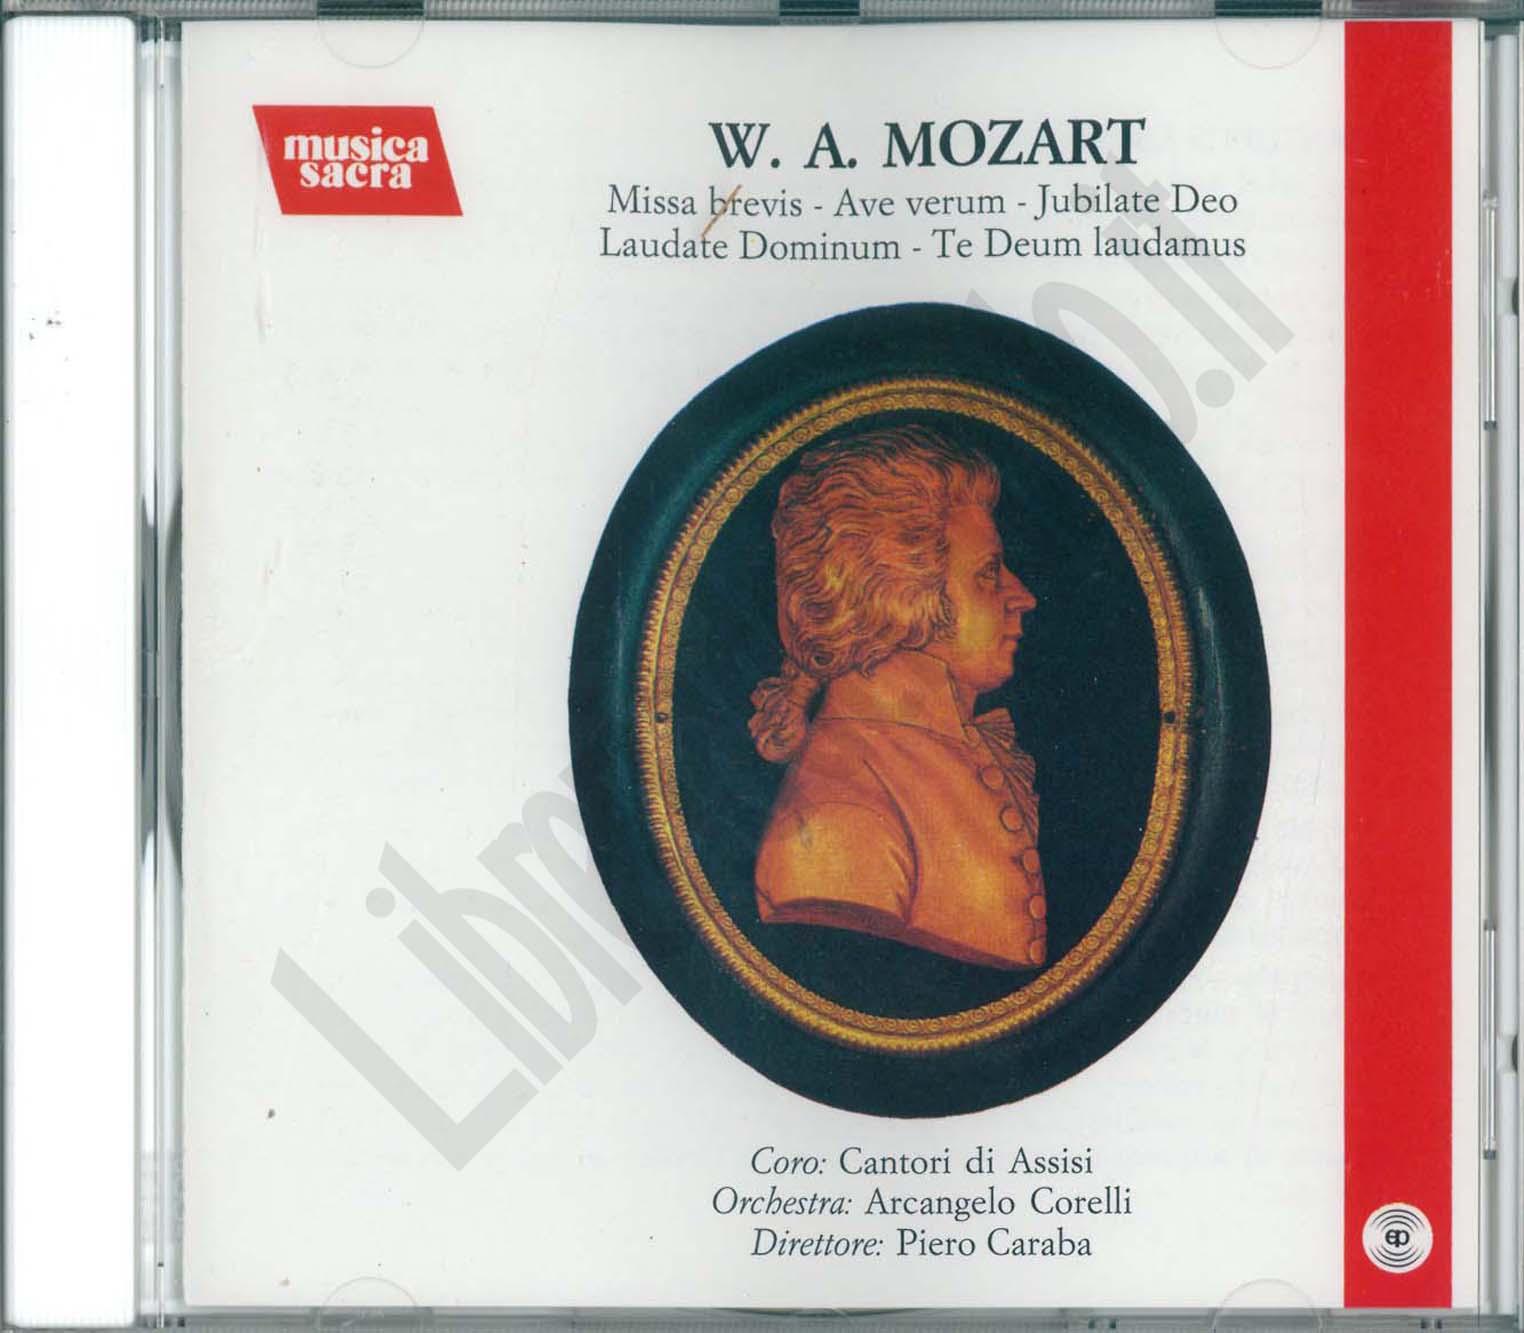 W. A. Mozart, CD Musica classica - LibreriadelSanto.it